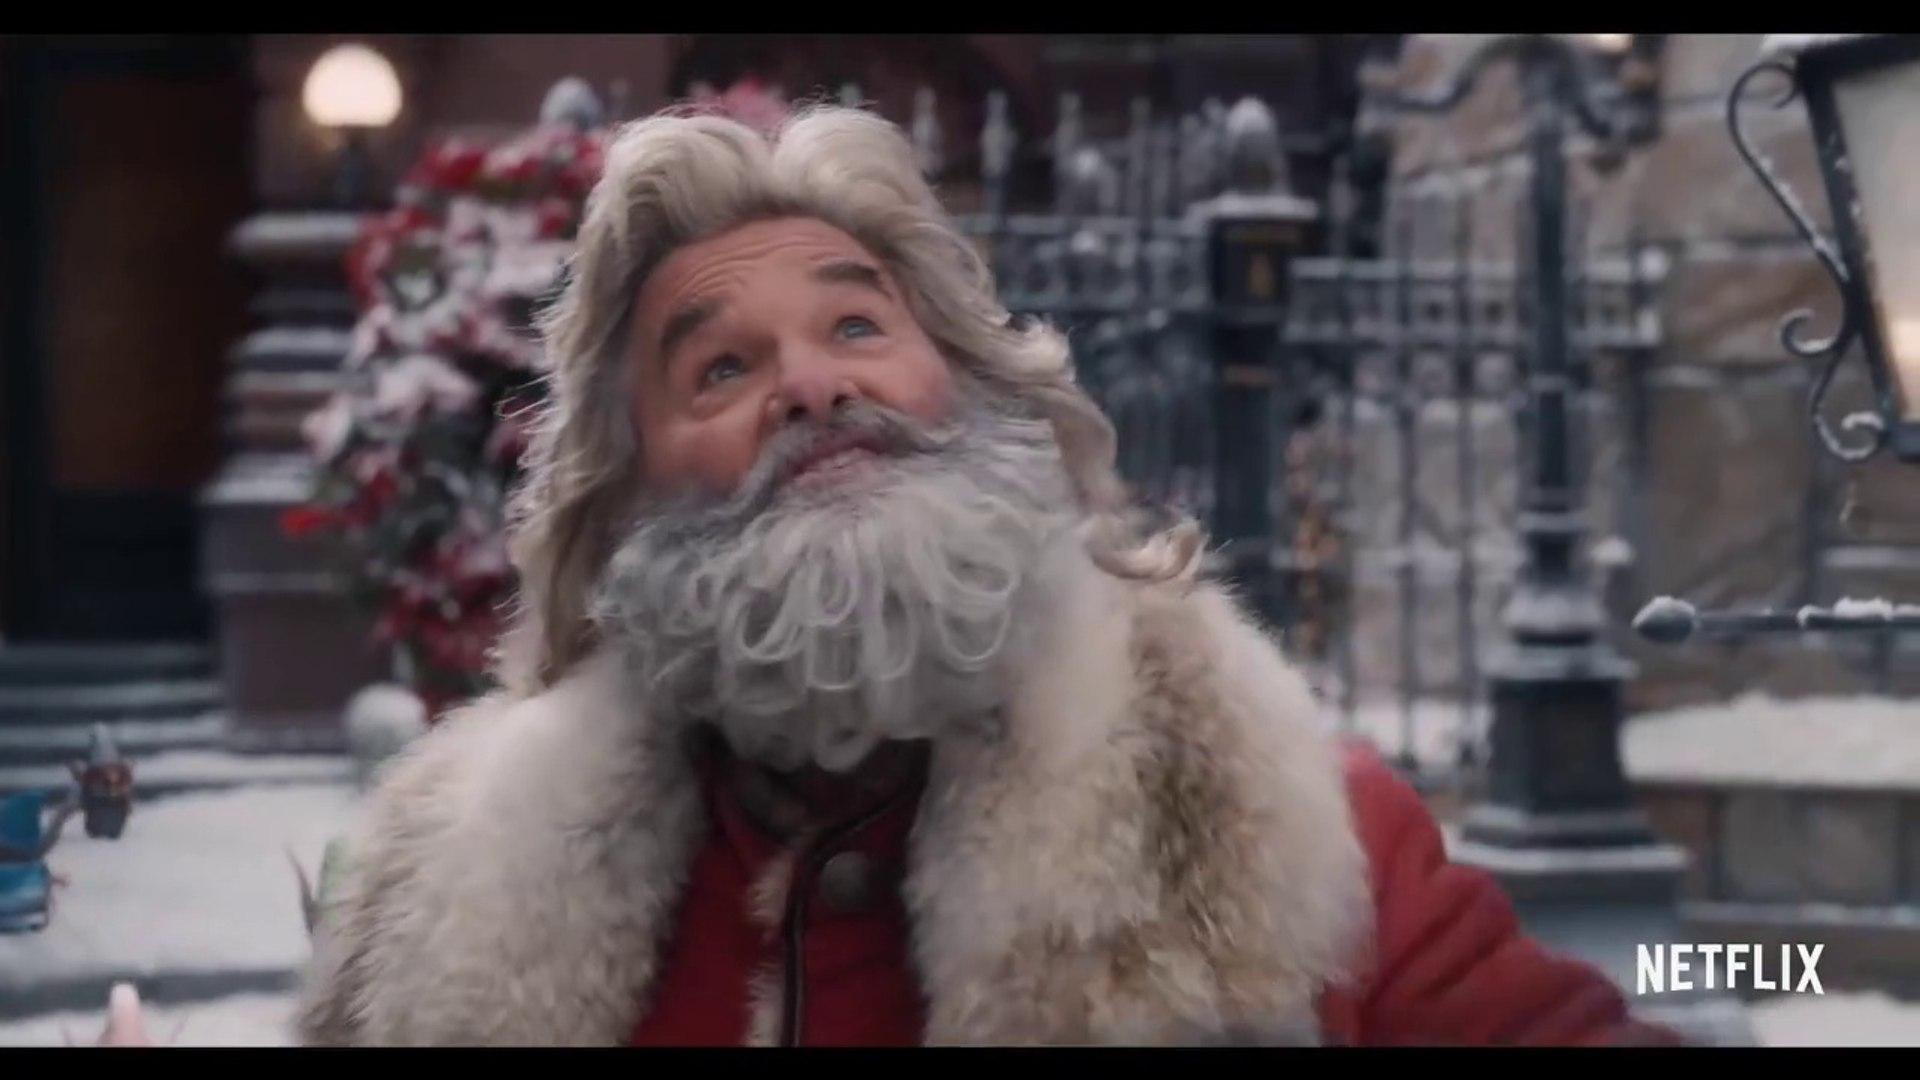 THE CHRISTMAS CHRONICLES 2 Trailer (2020)